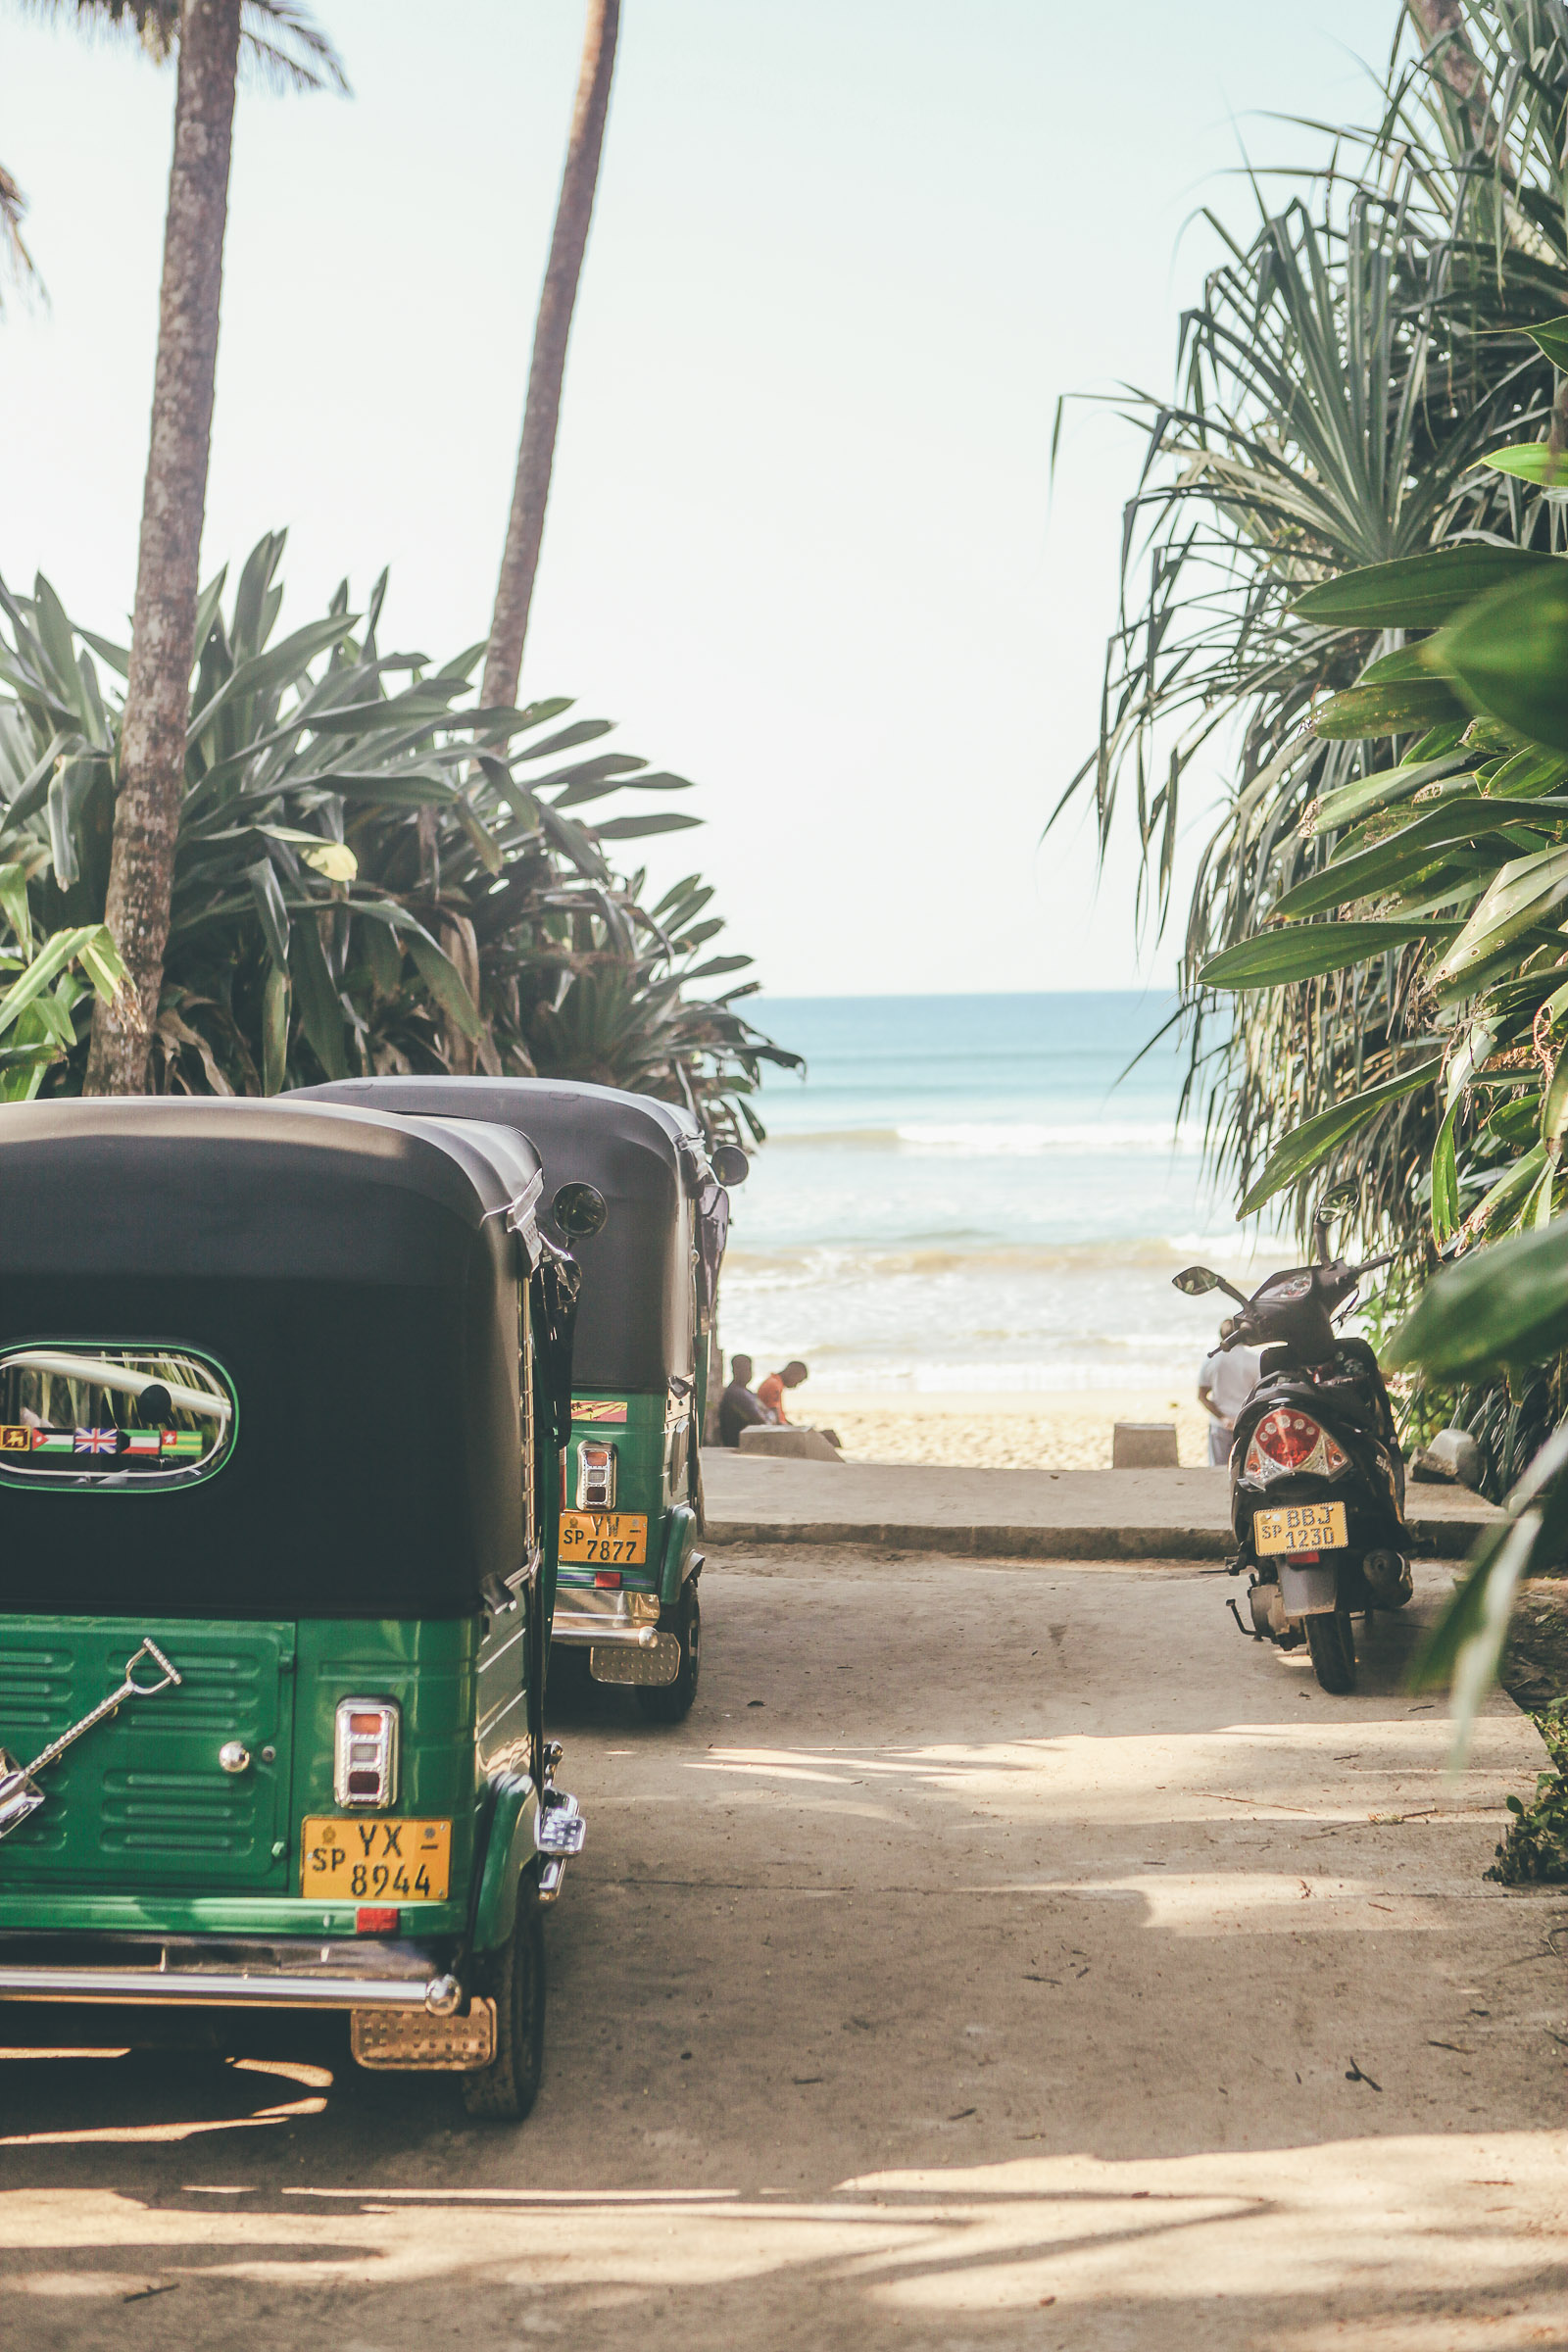 Sunshinestories-Sri-Lanka-Medawatta-Medawata-Meda-Watta-Mada-surf-Lonboard-Surfing-Wave-Surf-School-Camp-Yoga-Studio-IMG_0781